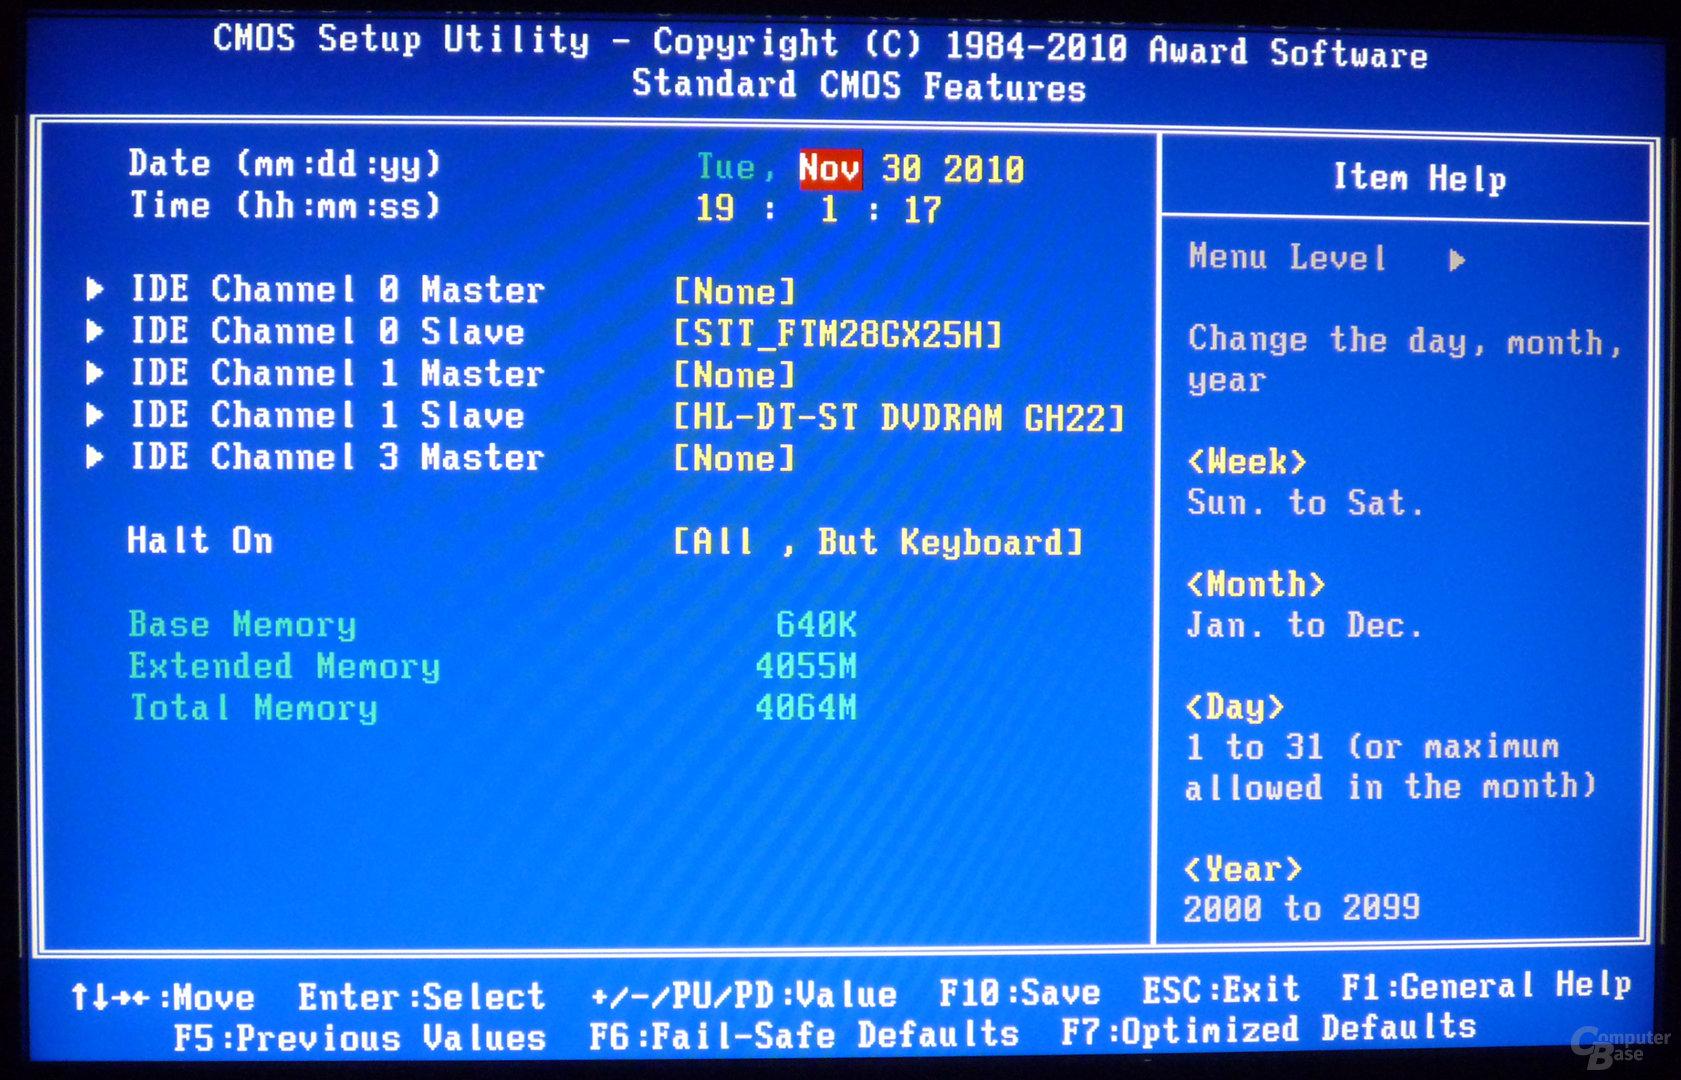 Gigabyte H55N-USB3 – BIOS